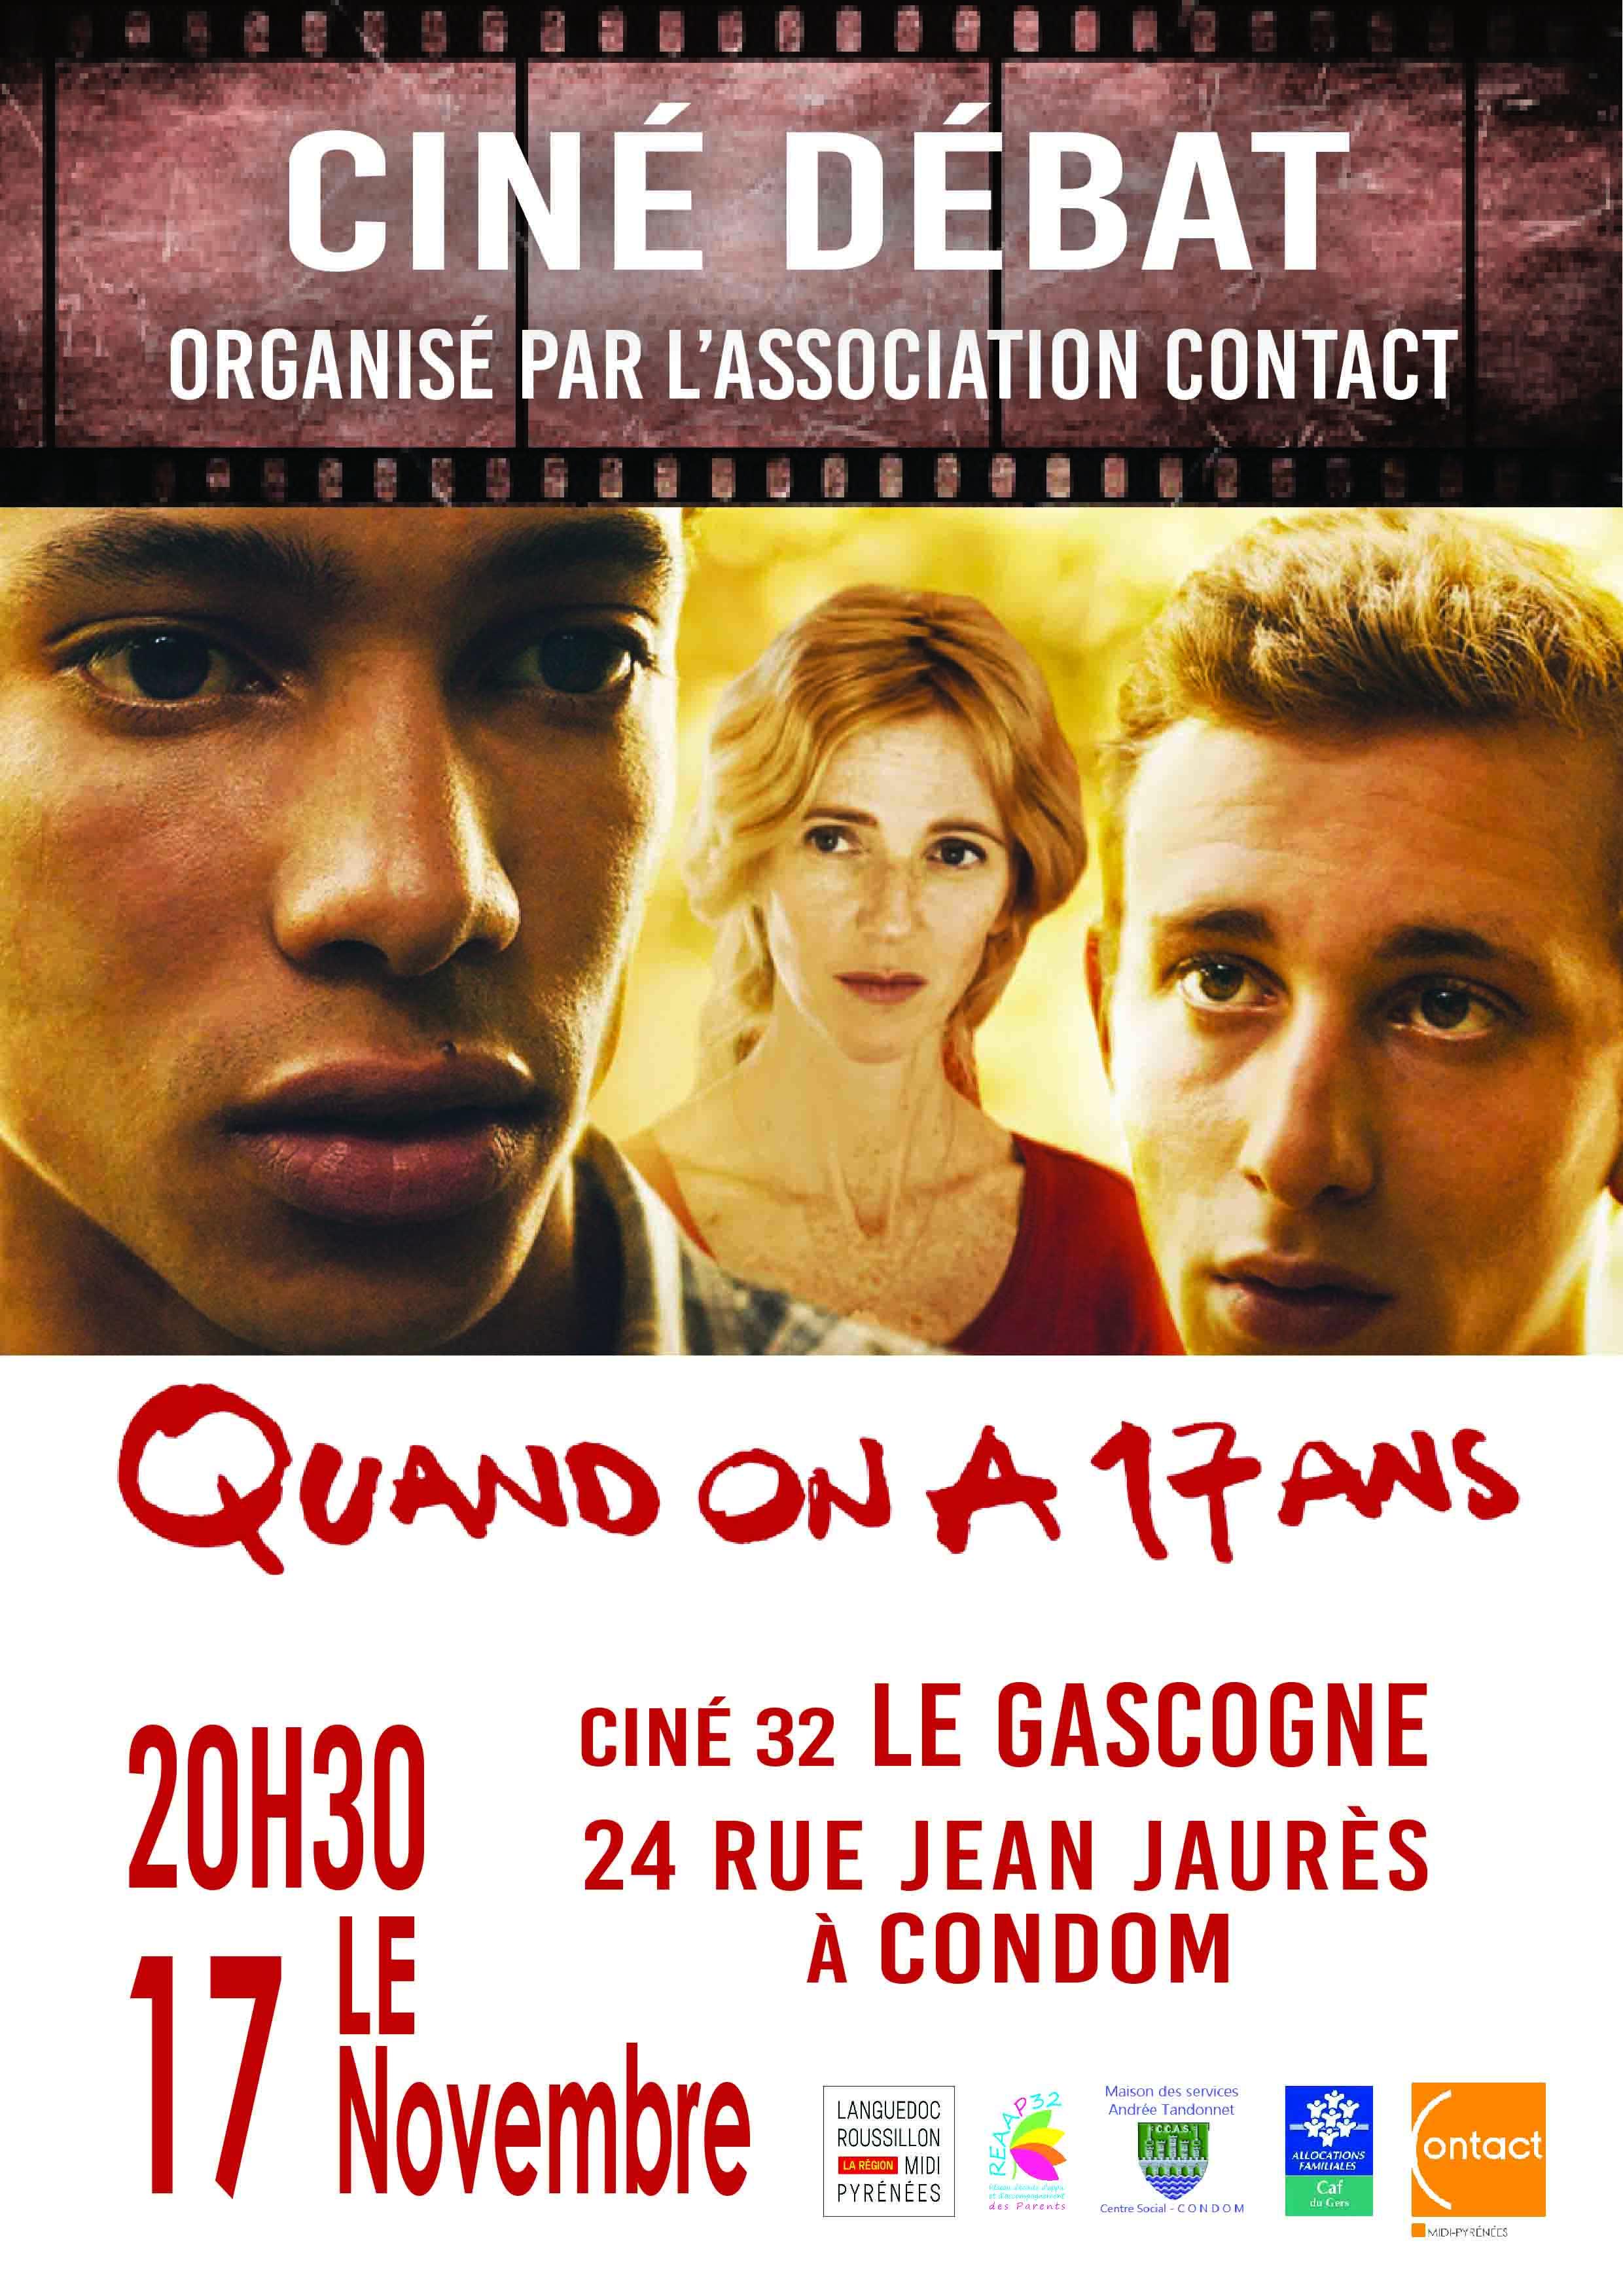 cine-debat-condom-17-novembre-20h30-film-quand-on-a-17-ans